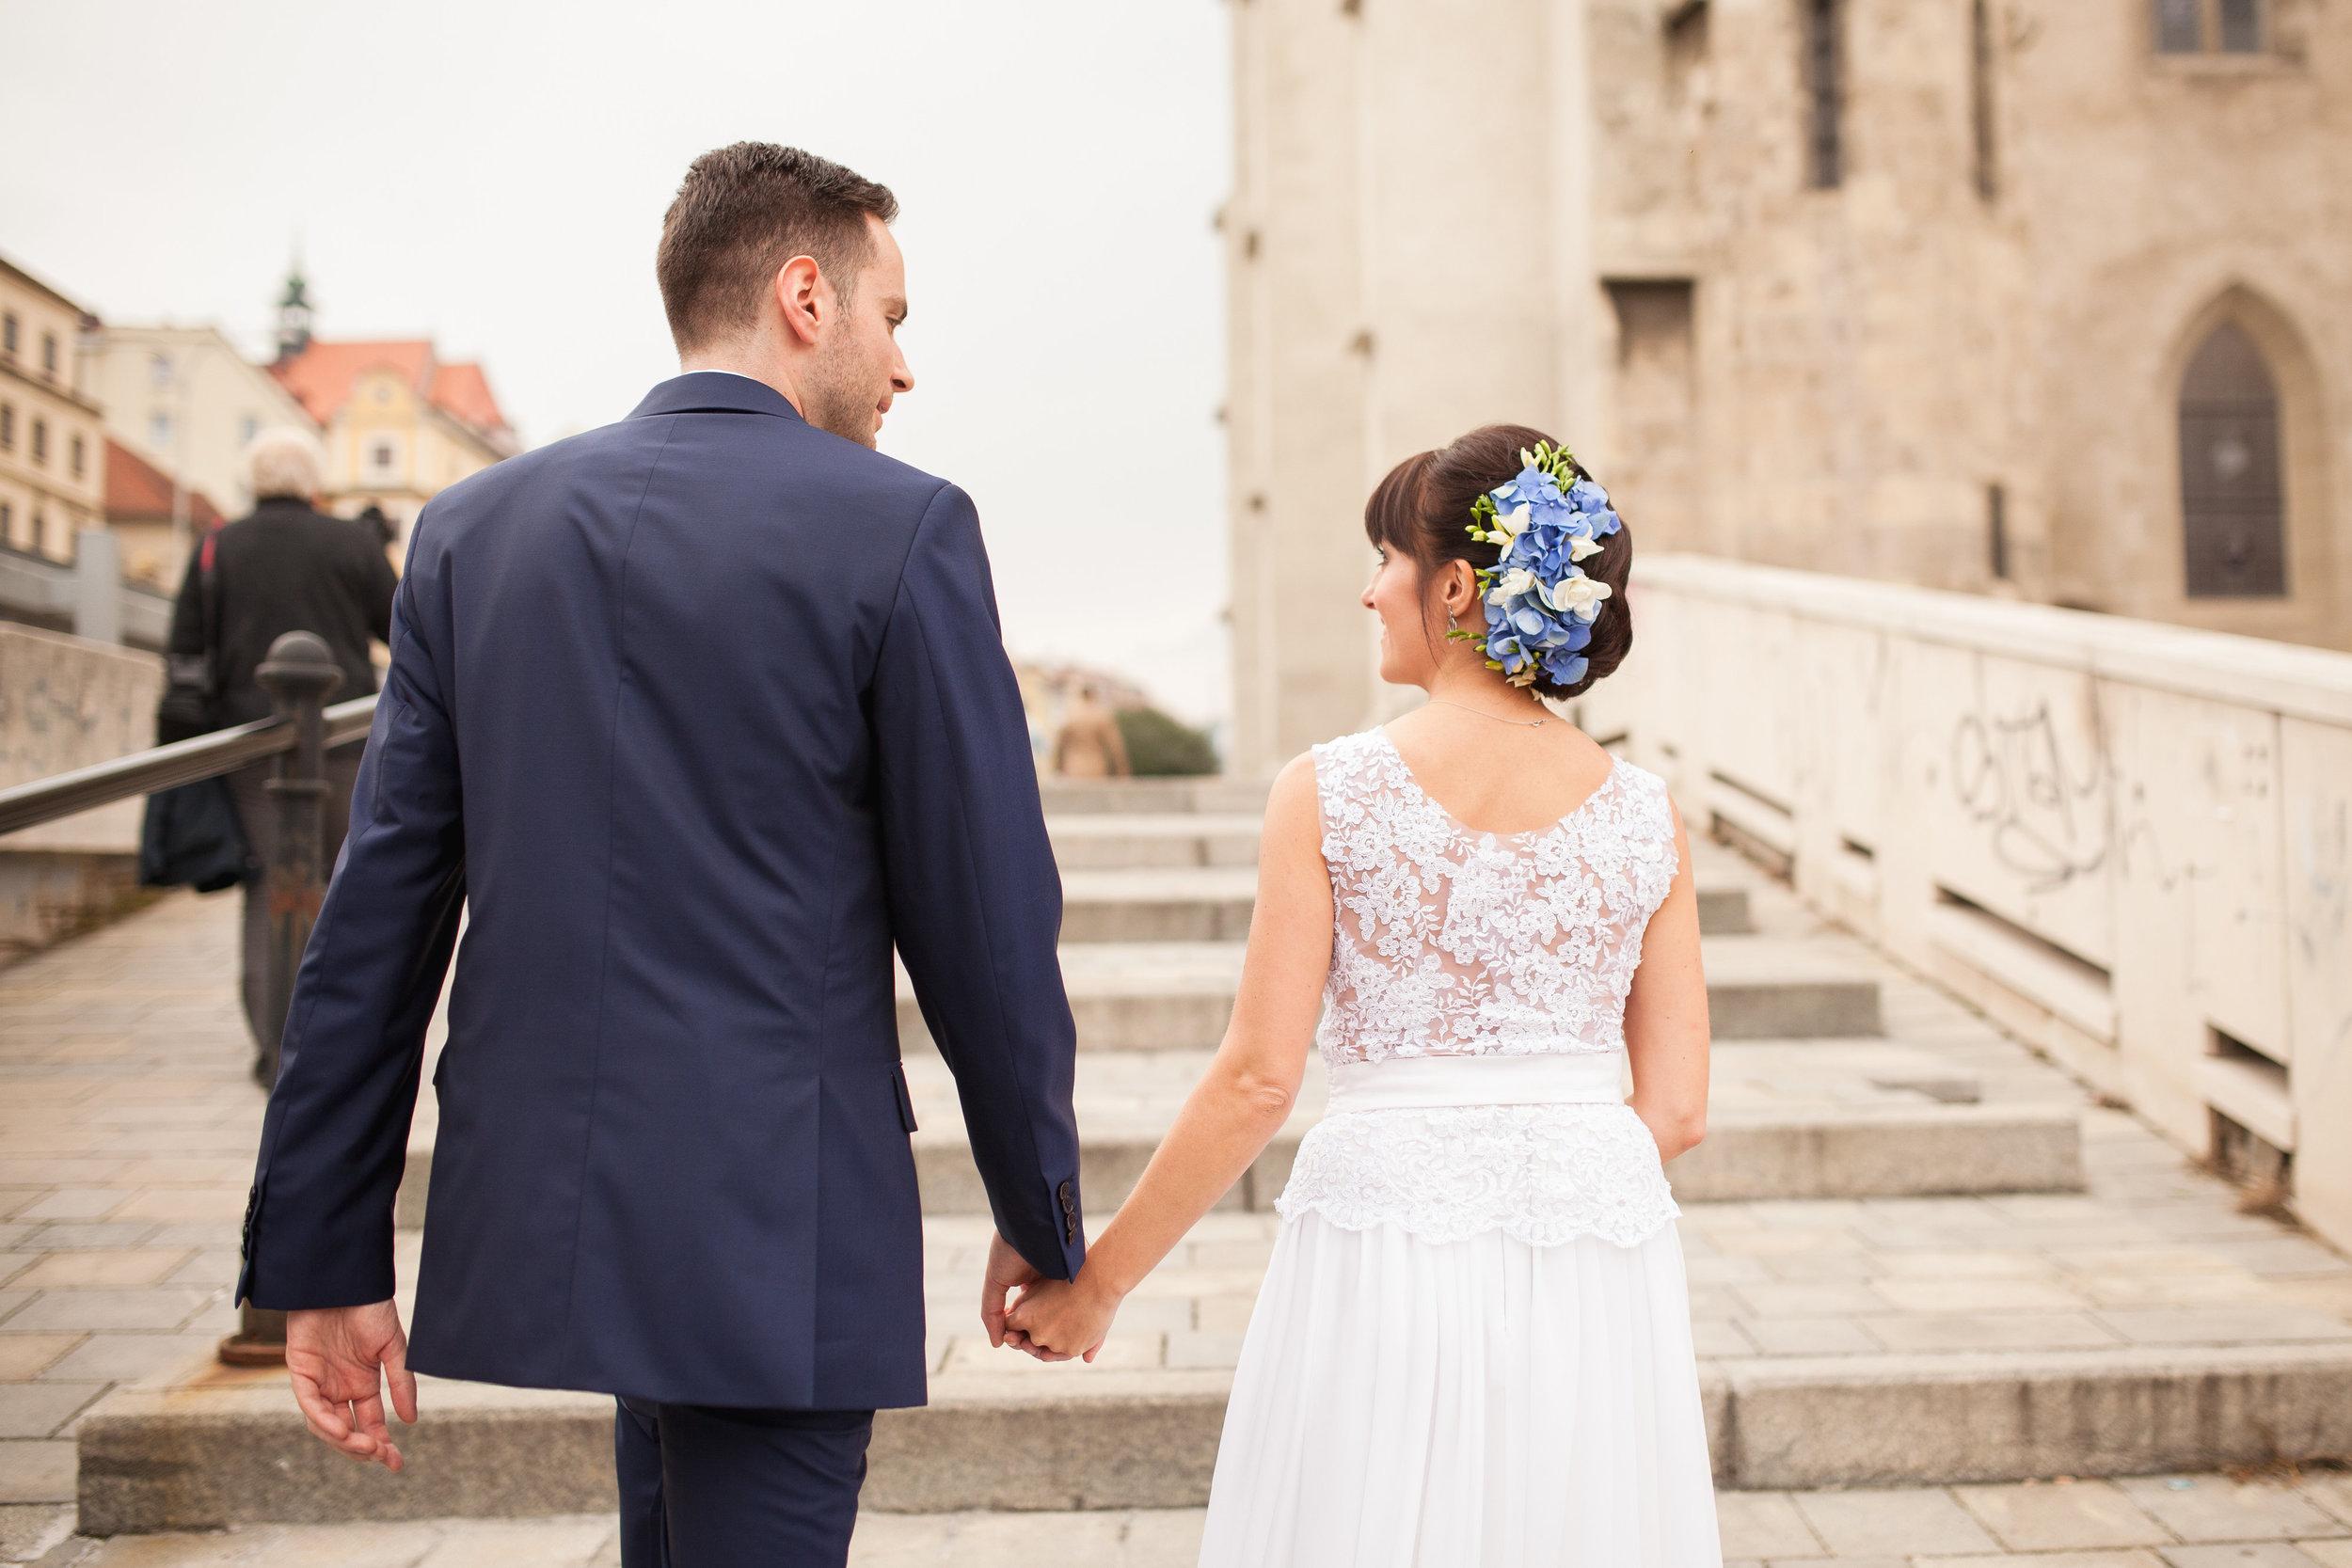 destination-wedding-photographer-bratislava-slovakia-europe-portrait-session-4.jpg